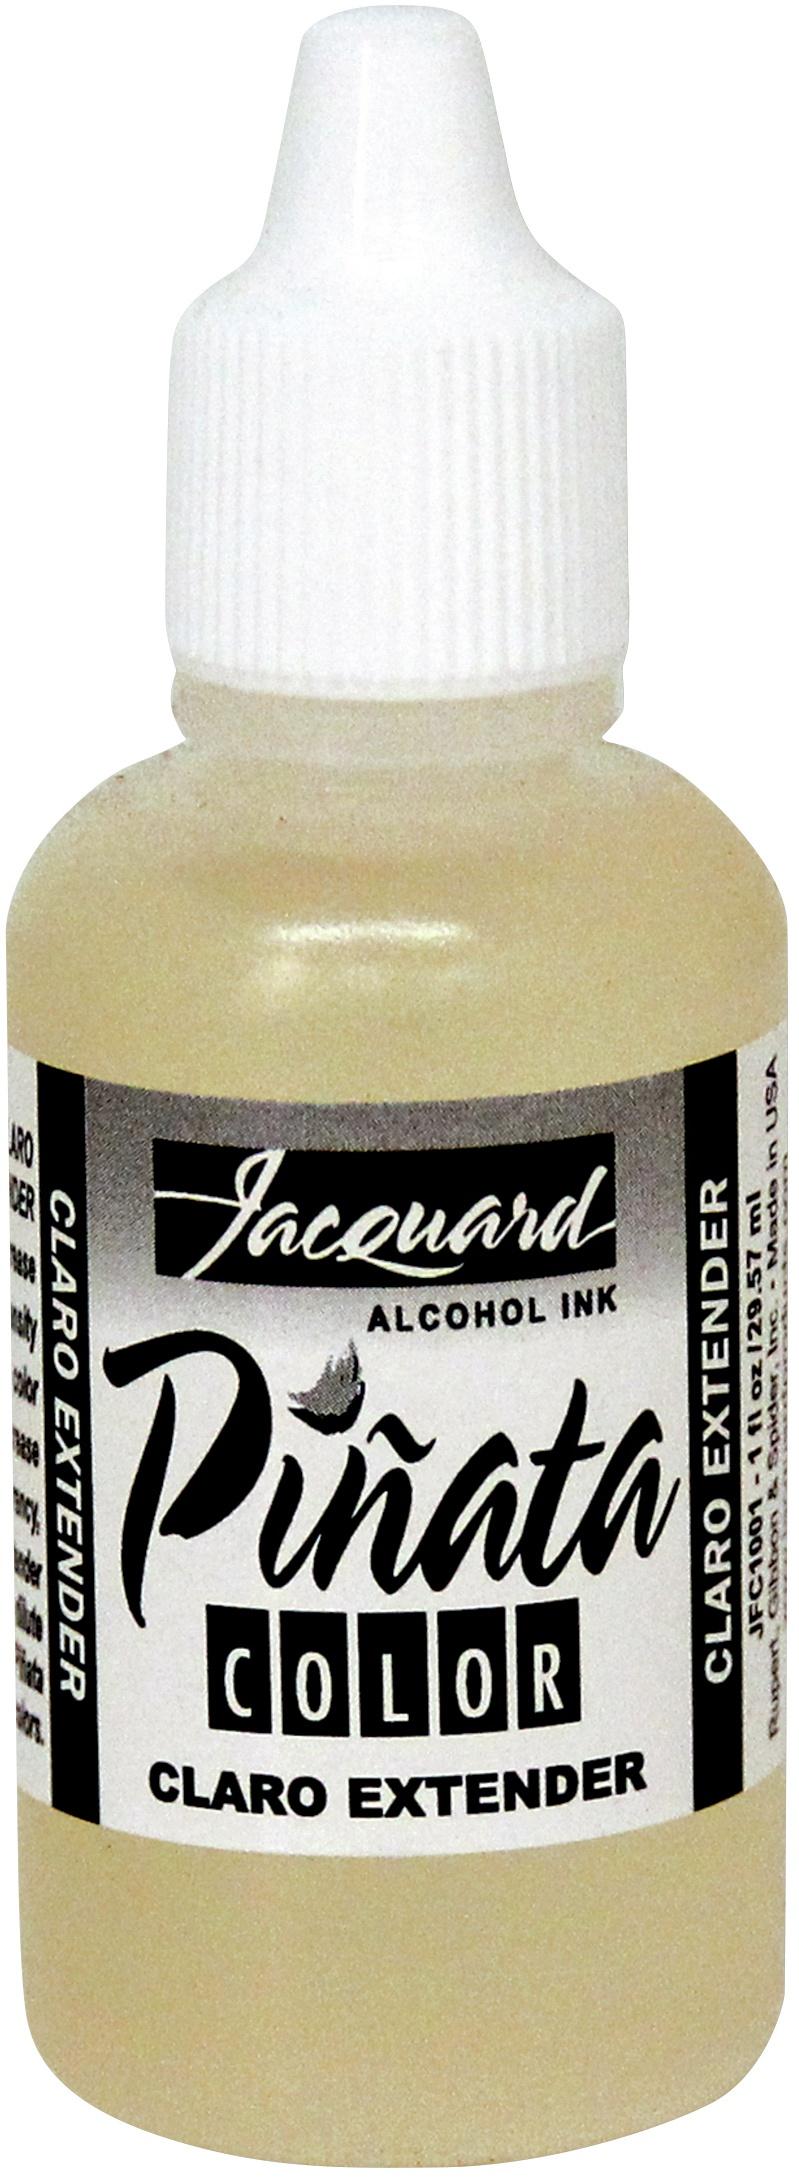 Alcohol Ink Pinata Color Claro Extender